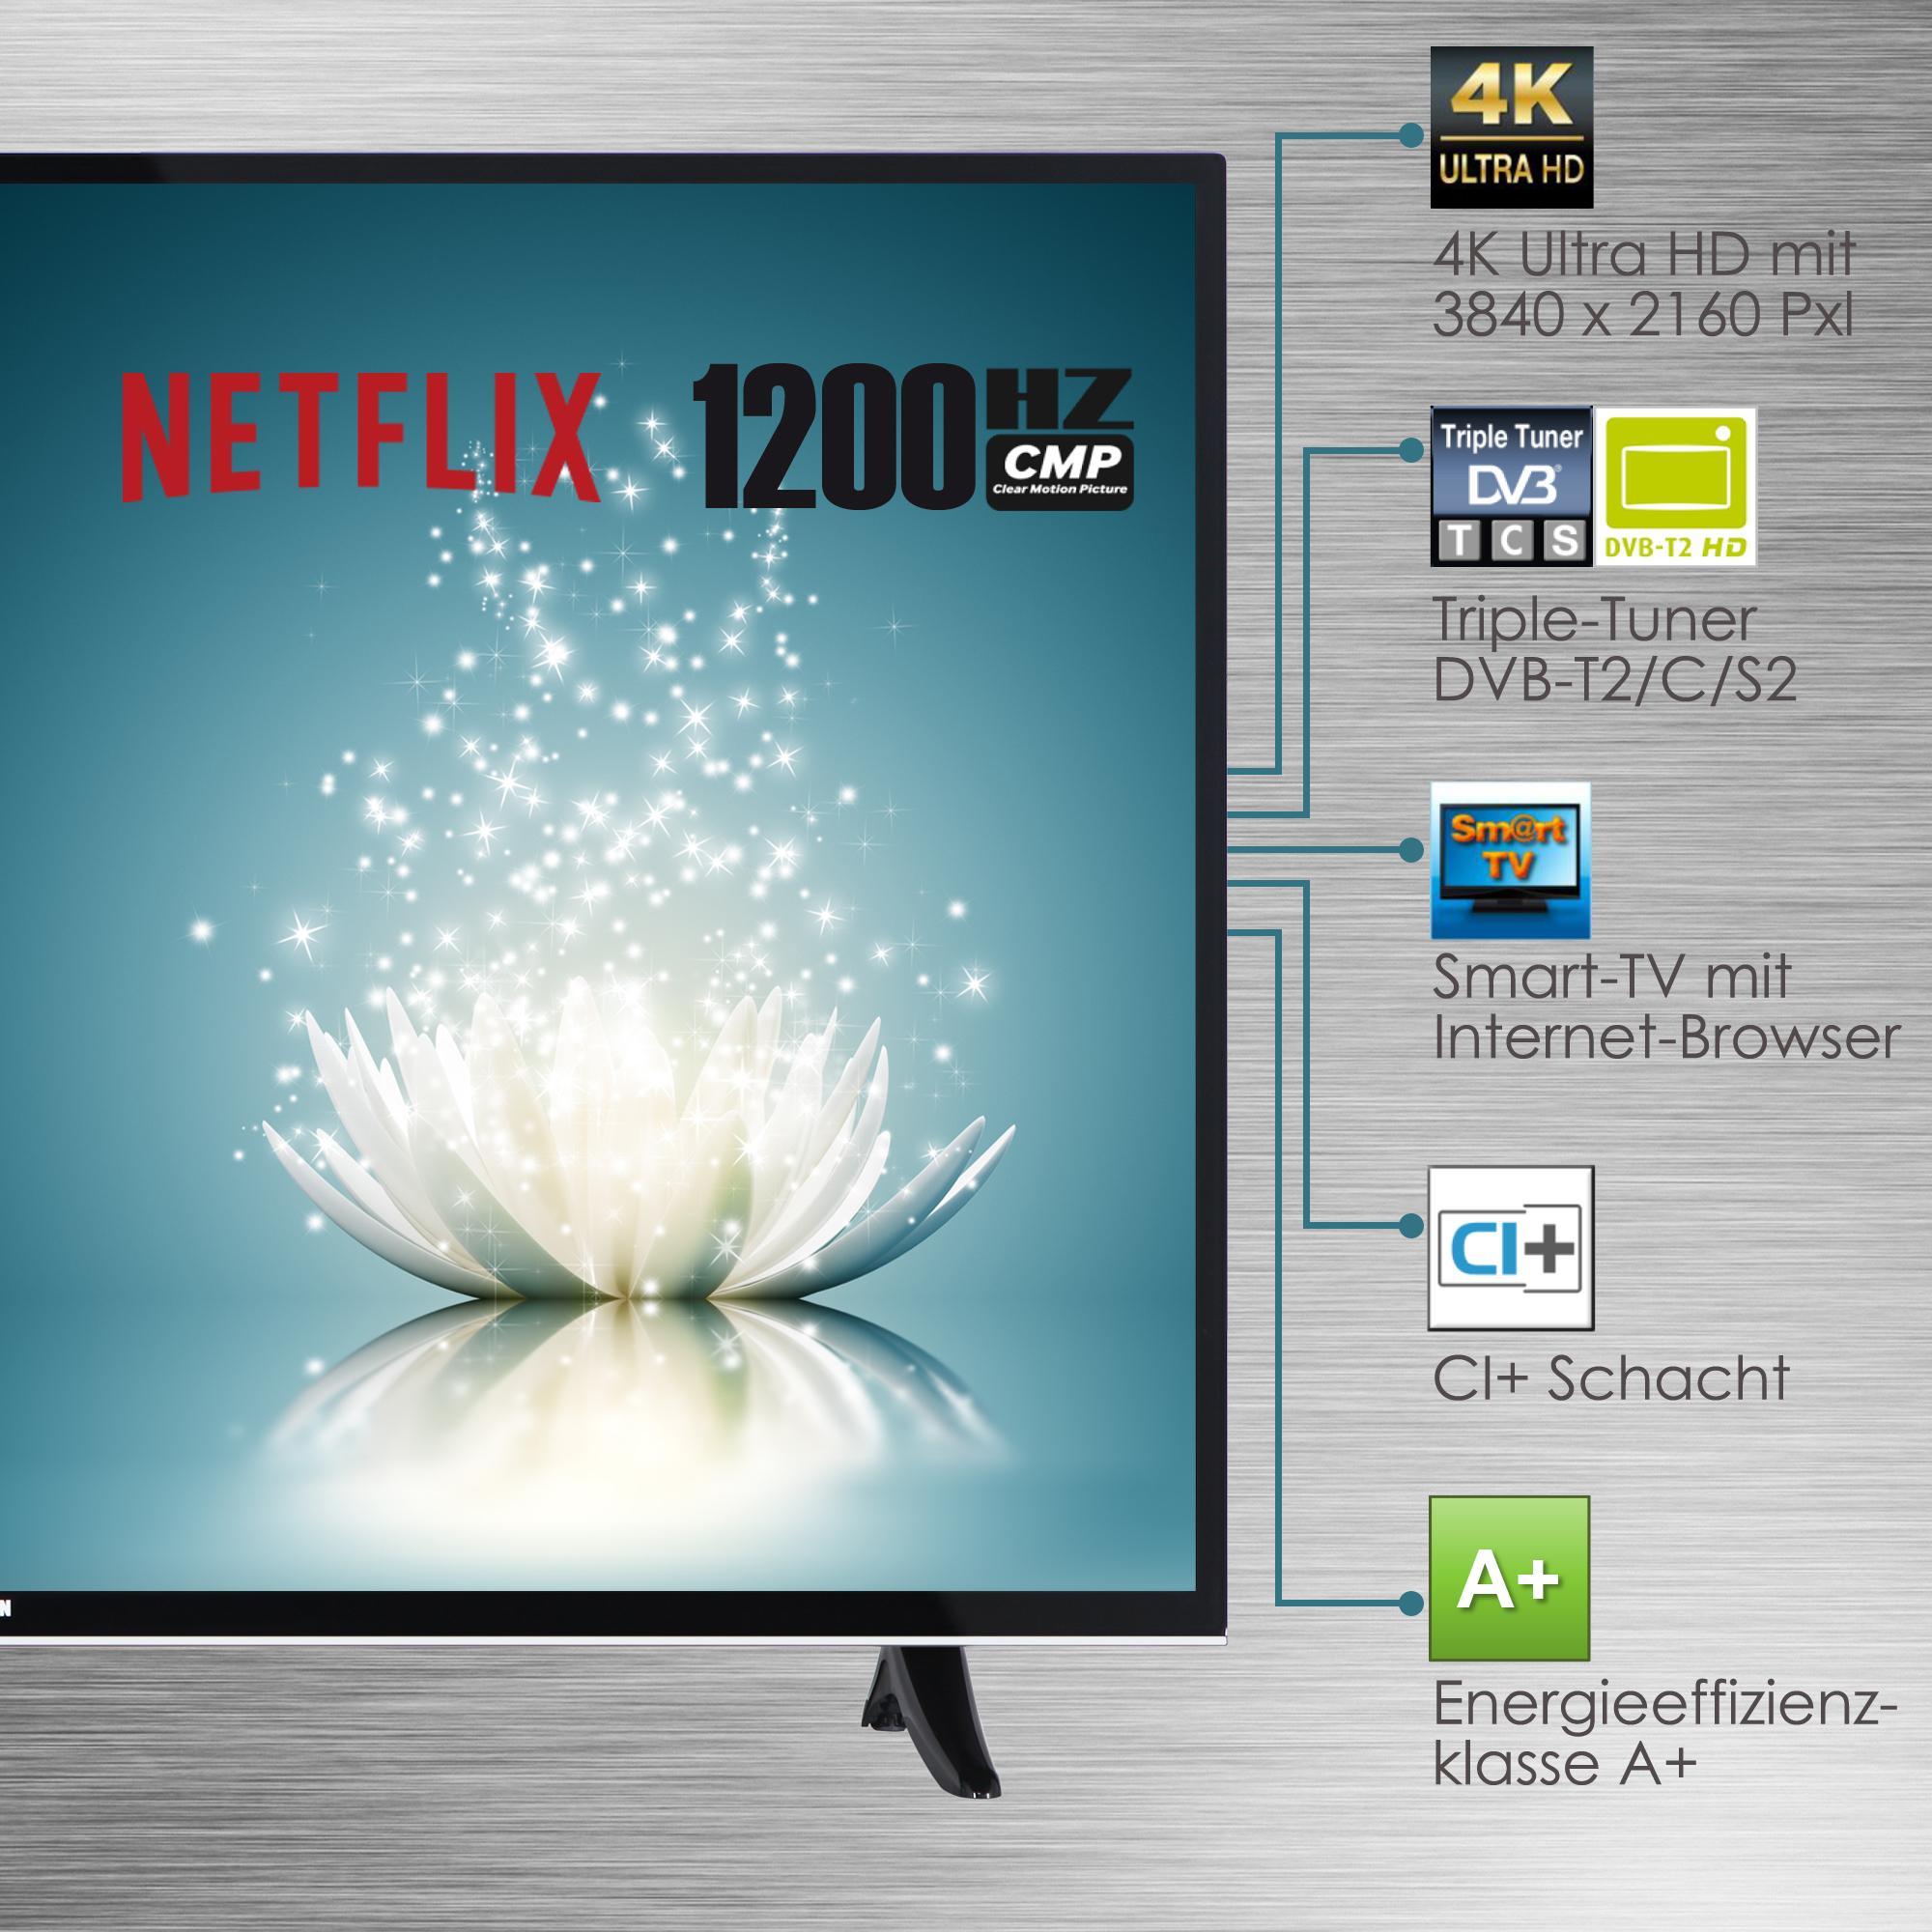 telefunken xu43a401 110 cm 43 zoll fernseher 4k ultra hd triple tuner smart tv. Black Bedroom Furniture Sets. Home Design Ideas